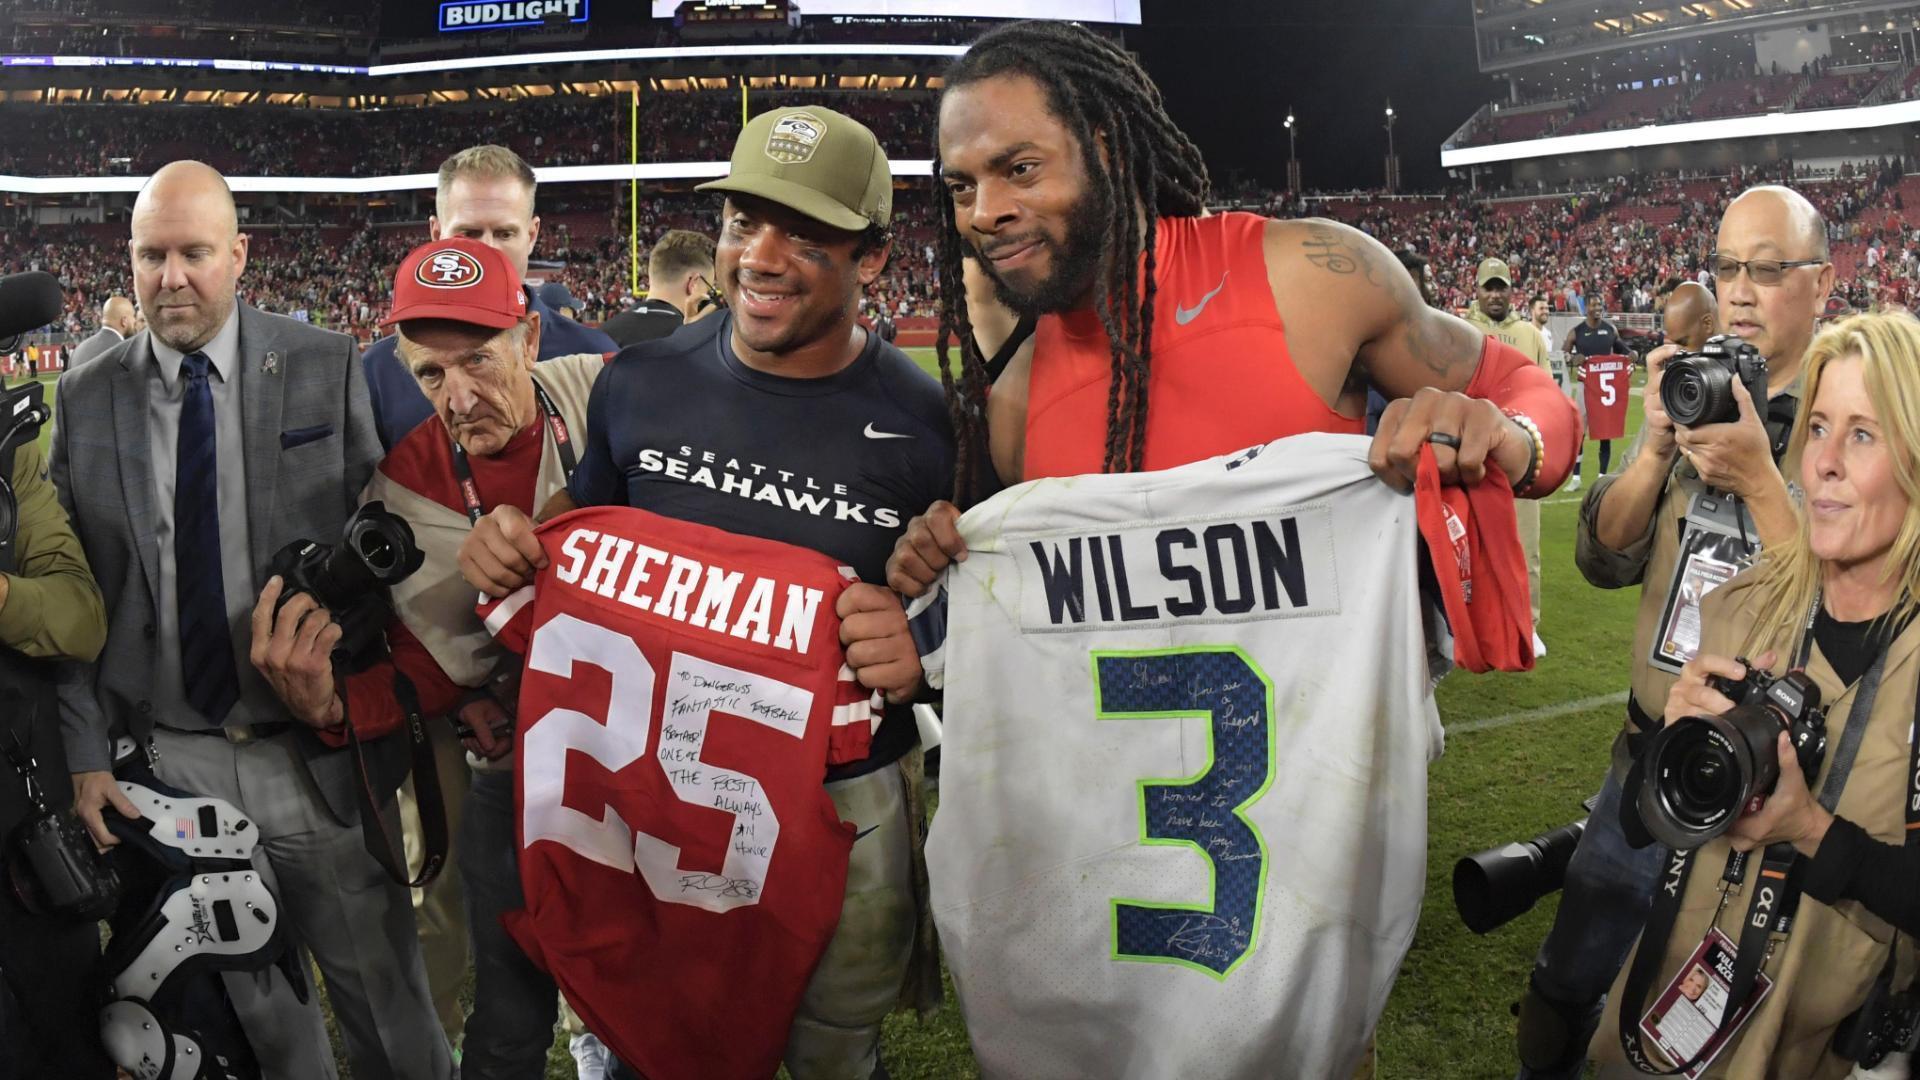 Wilson, Sherman exchange jerseys, hug it out